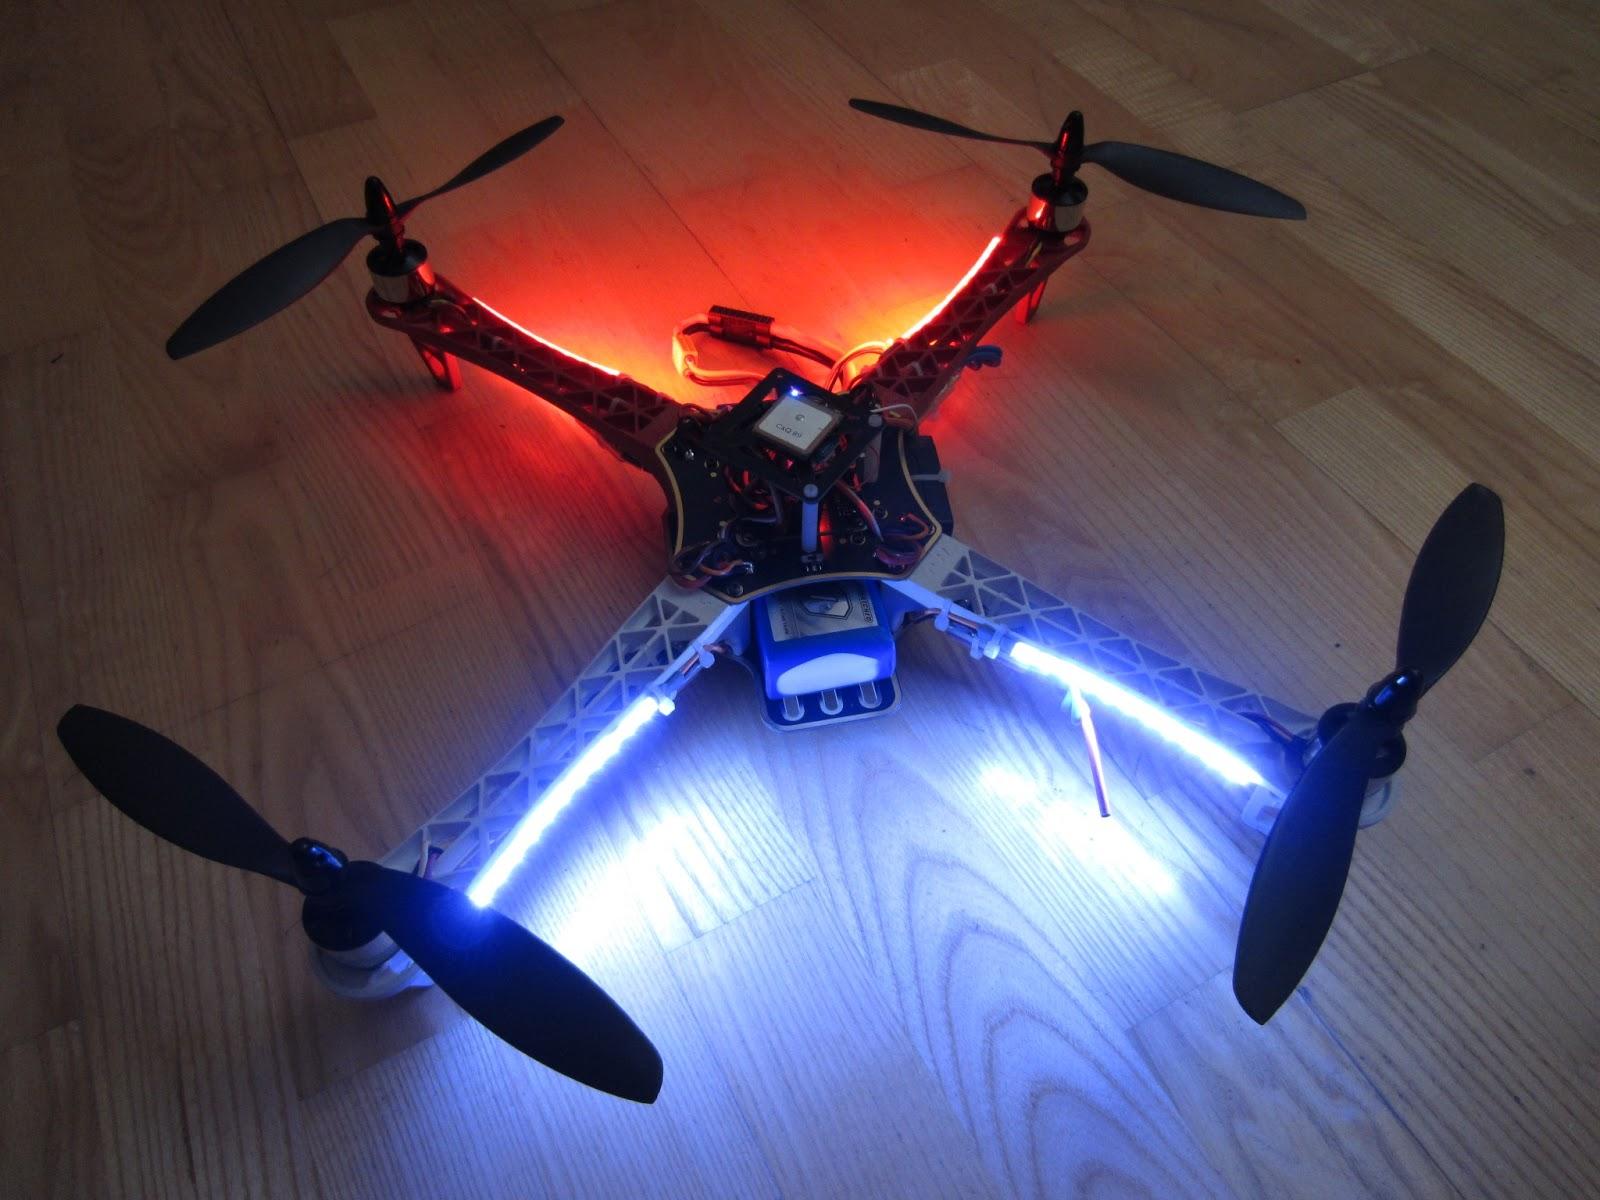 quadrocopter multiwii gps f450. Black Bedroom Furniture Sets. Home Design Ideas